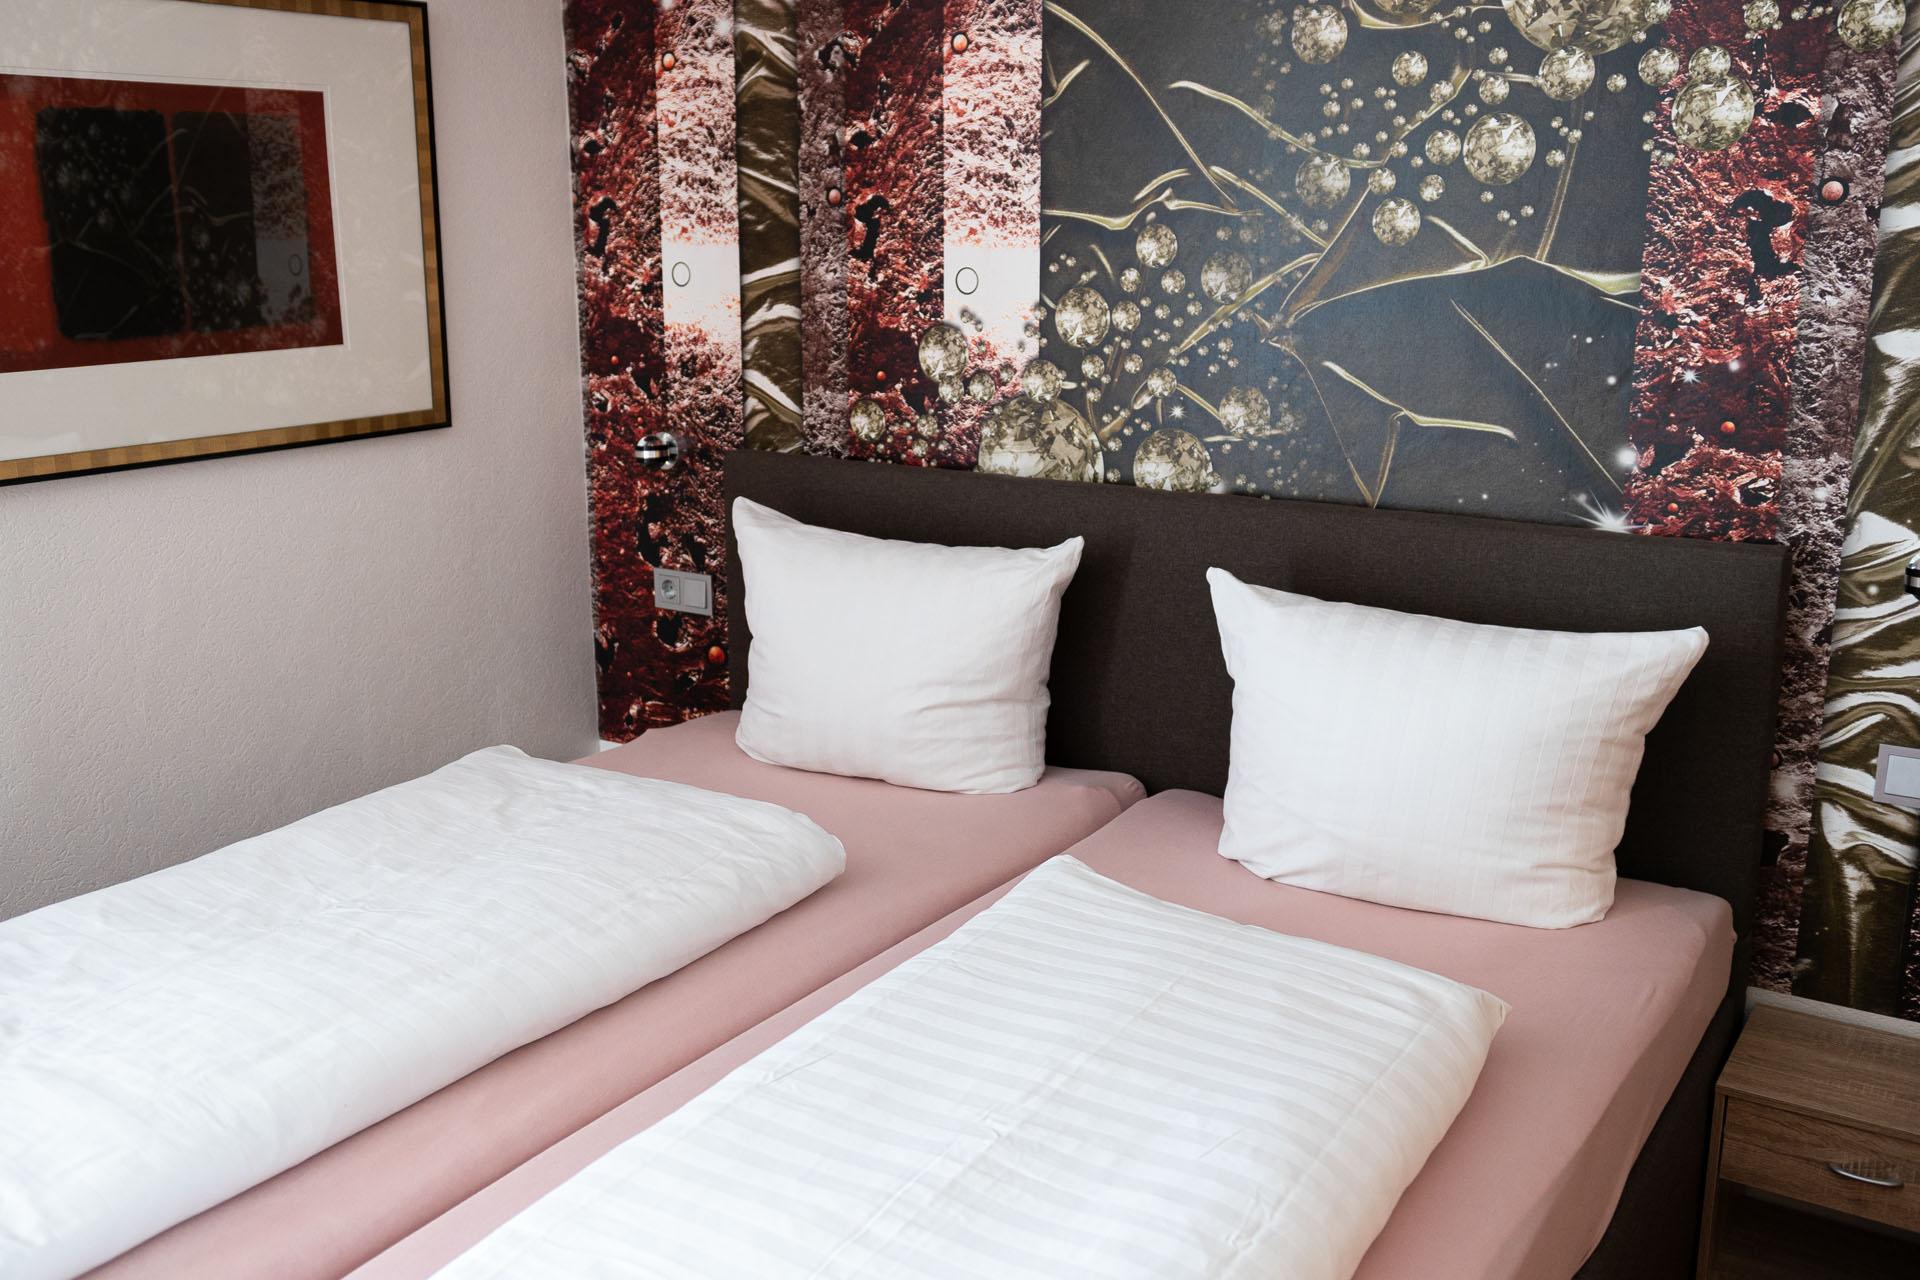 Hotel_Aggertal_Zimmer_Doppelzimmer03